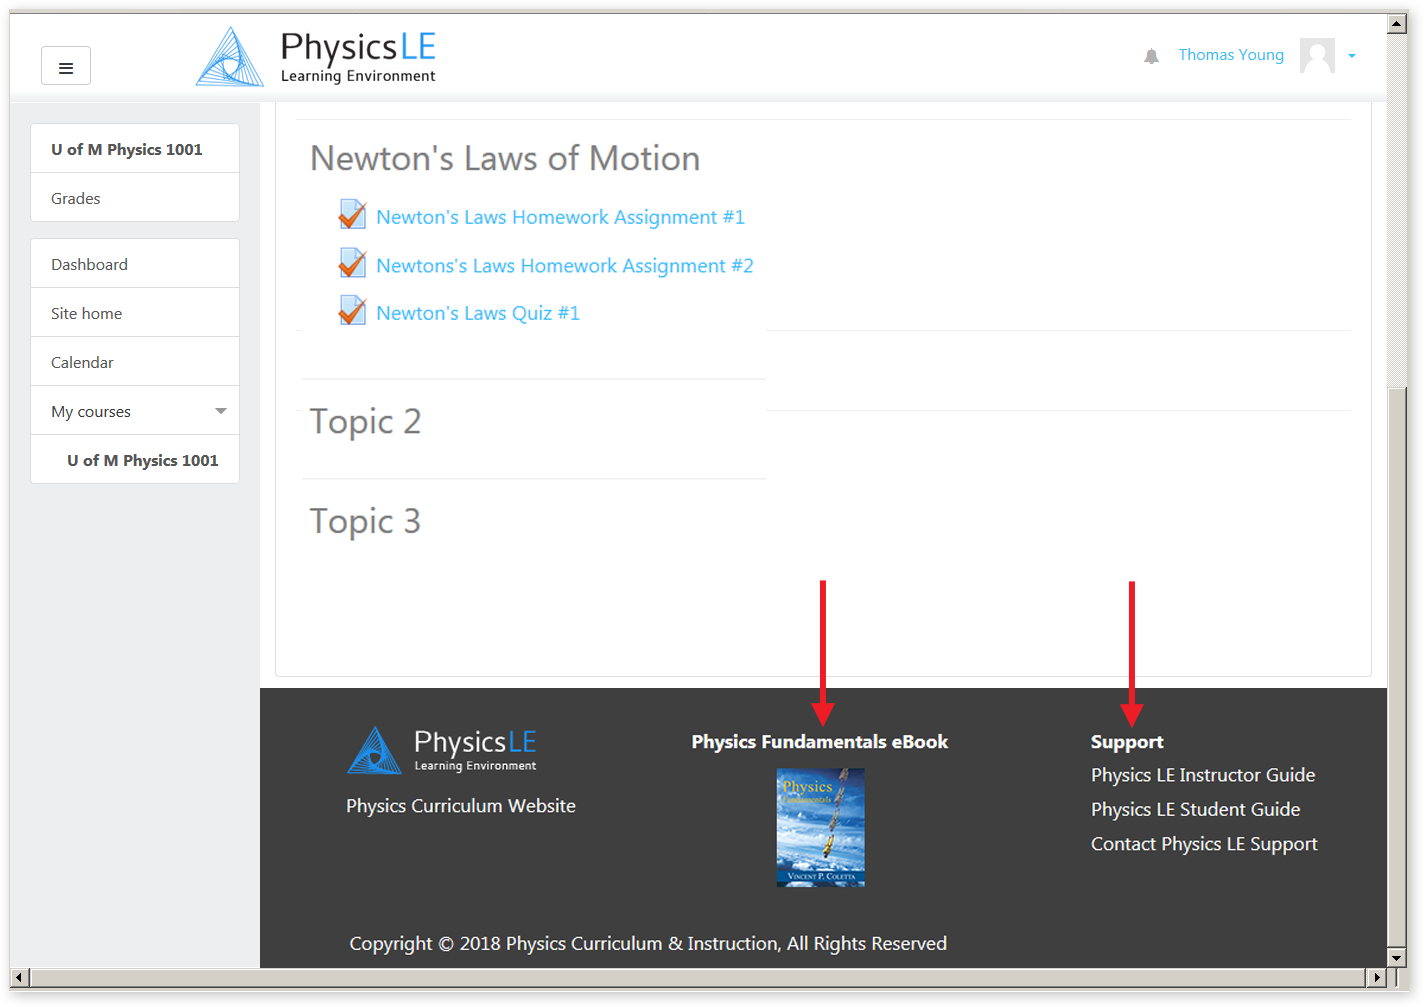 Physics Fundamentals eBook and Support